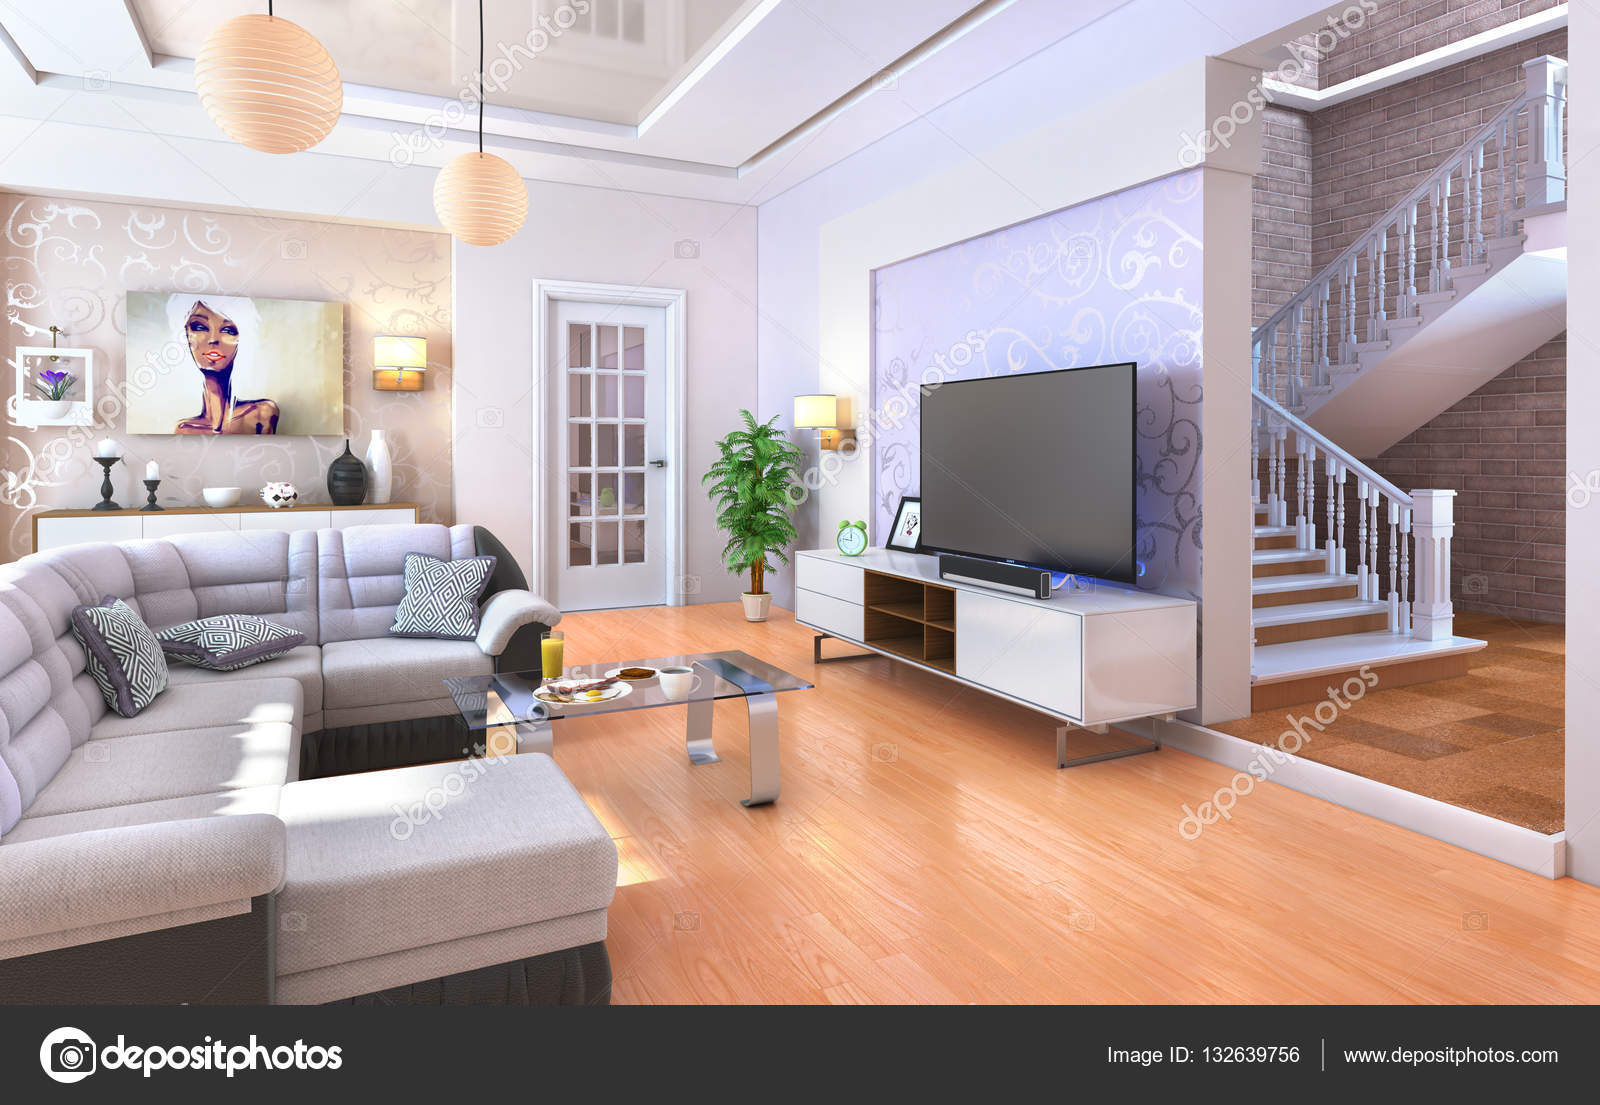 moderno living comedor con piso de madera ilustracin 3d foto de stock - Living Moderno